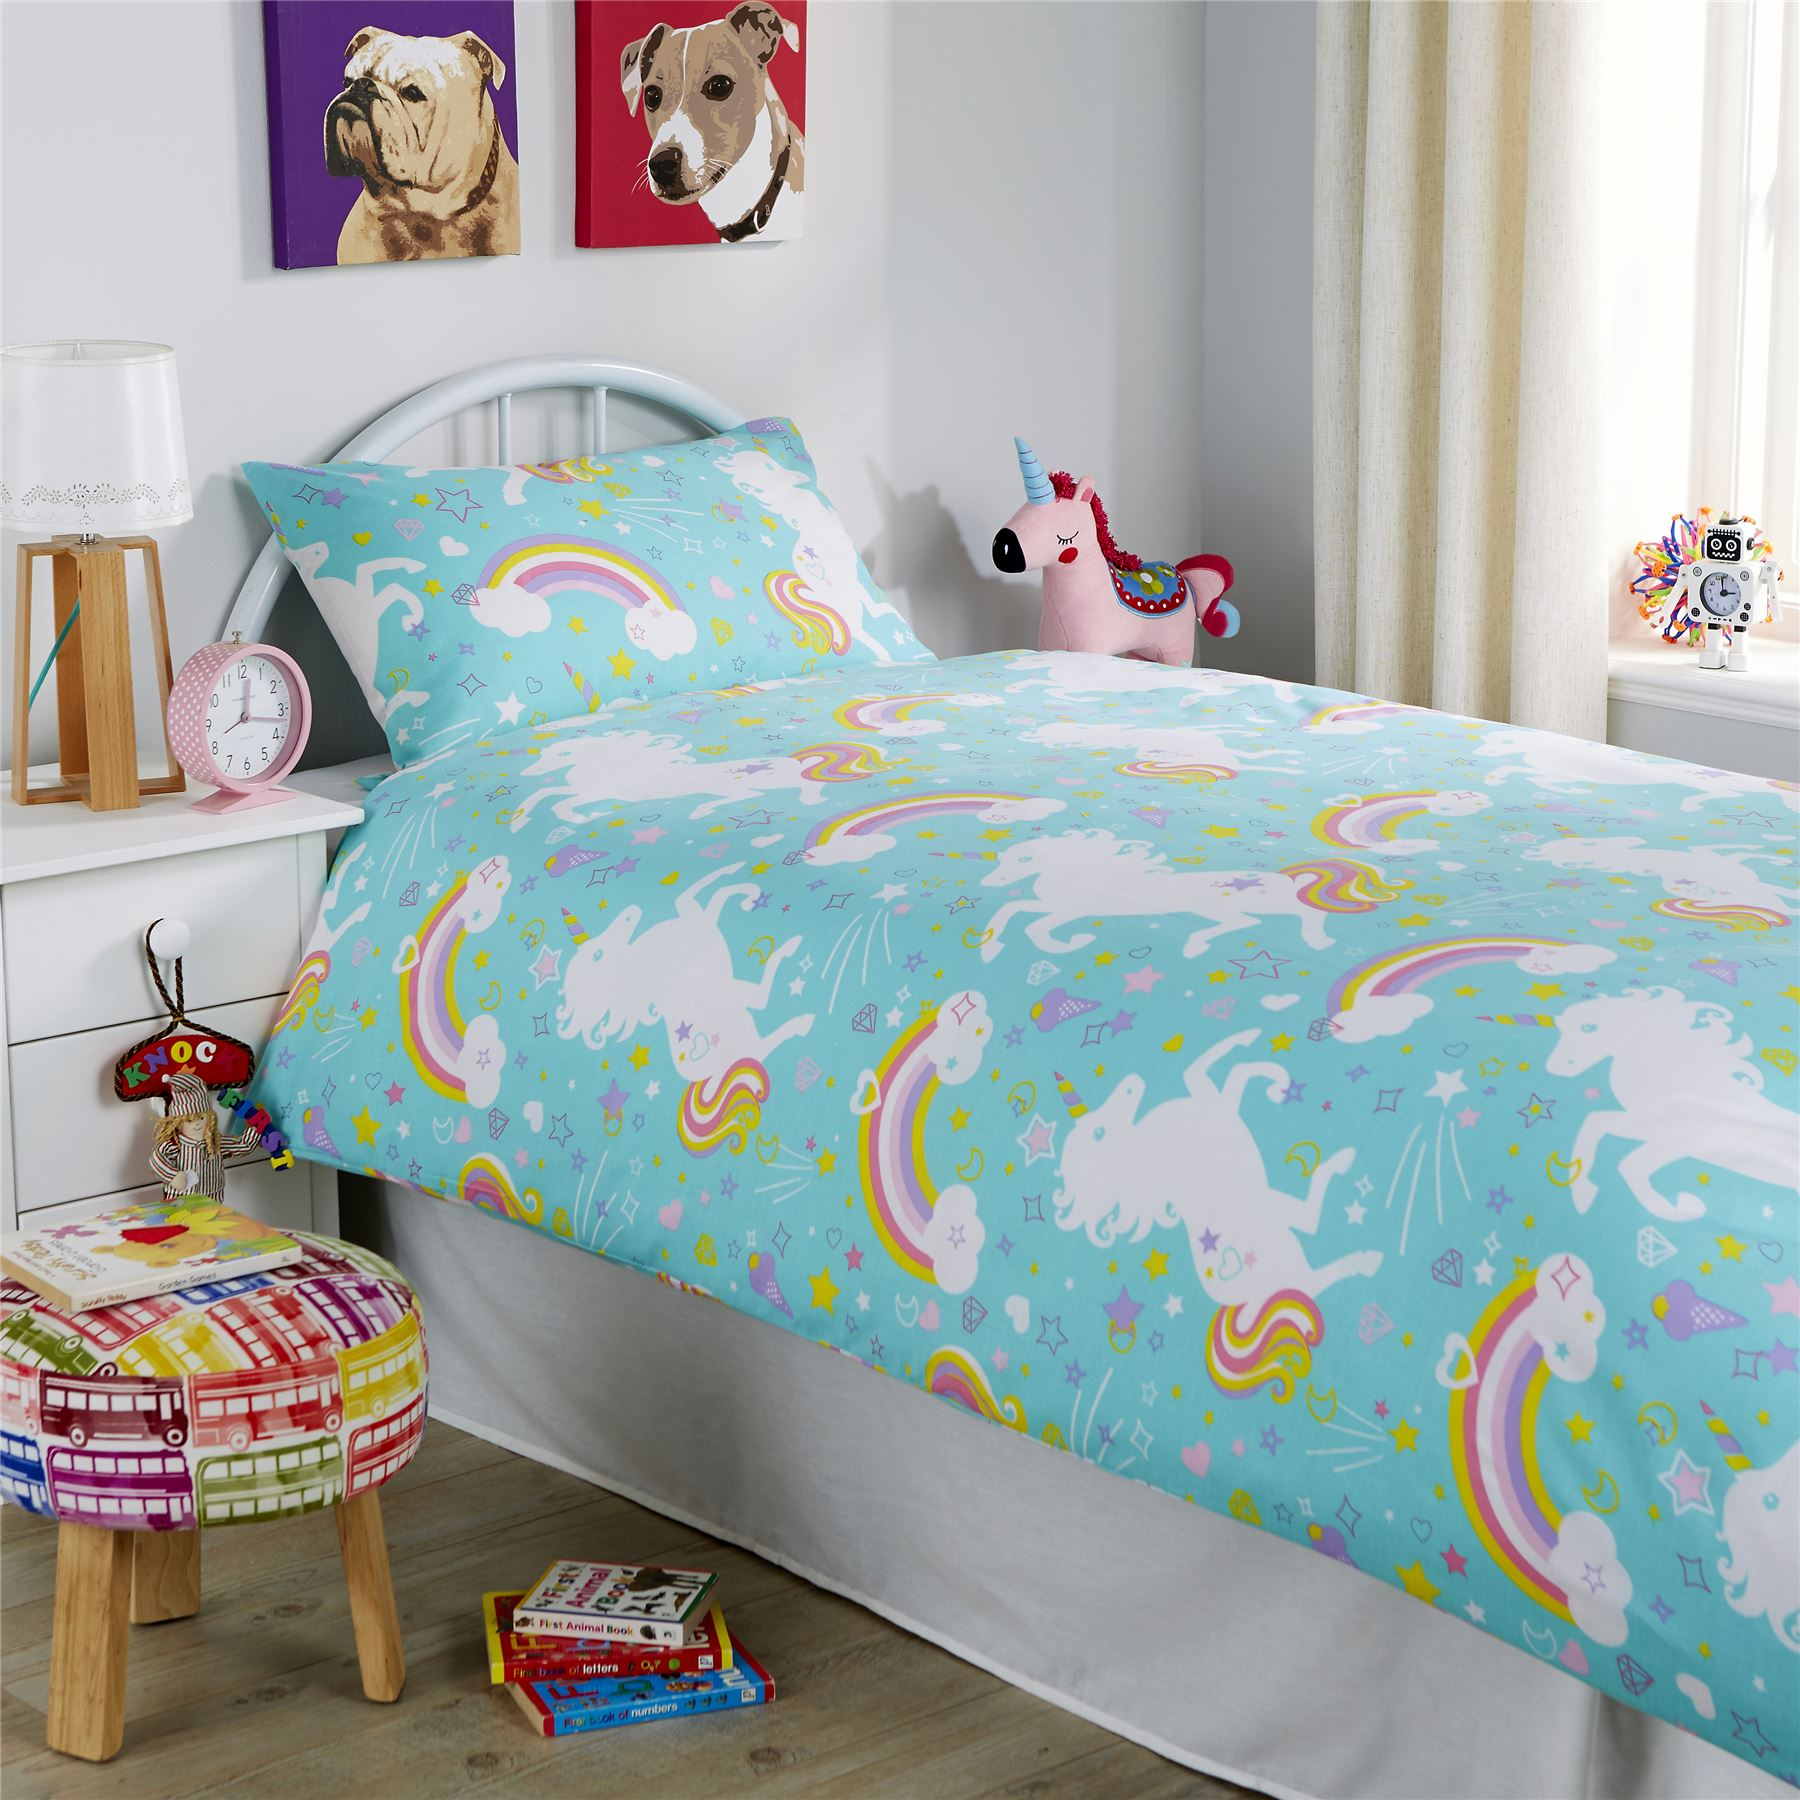 magical kids cover itm set duvet unicorns rainbows fairies bed unicorn pillow bedding case girls